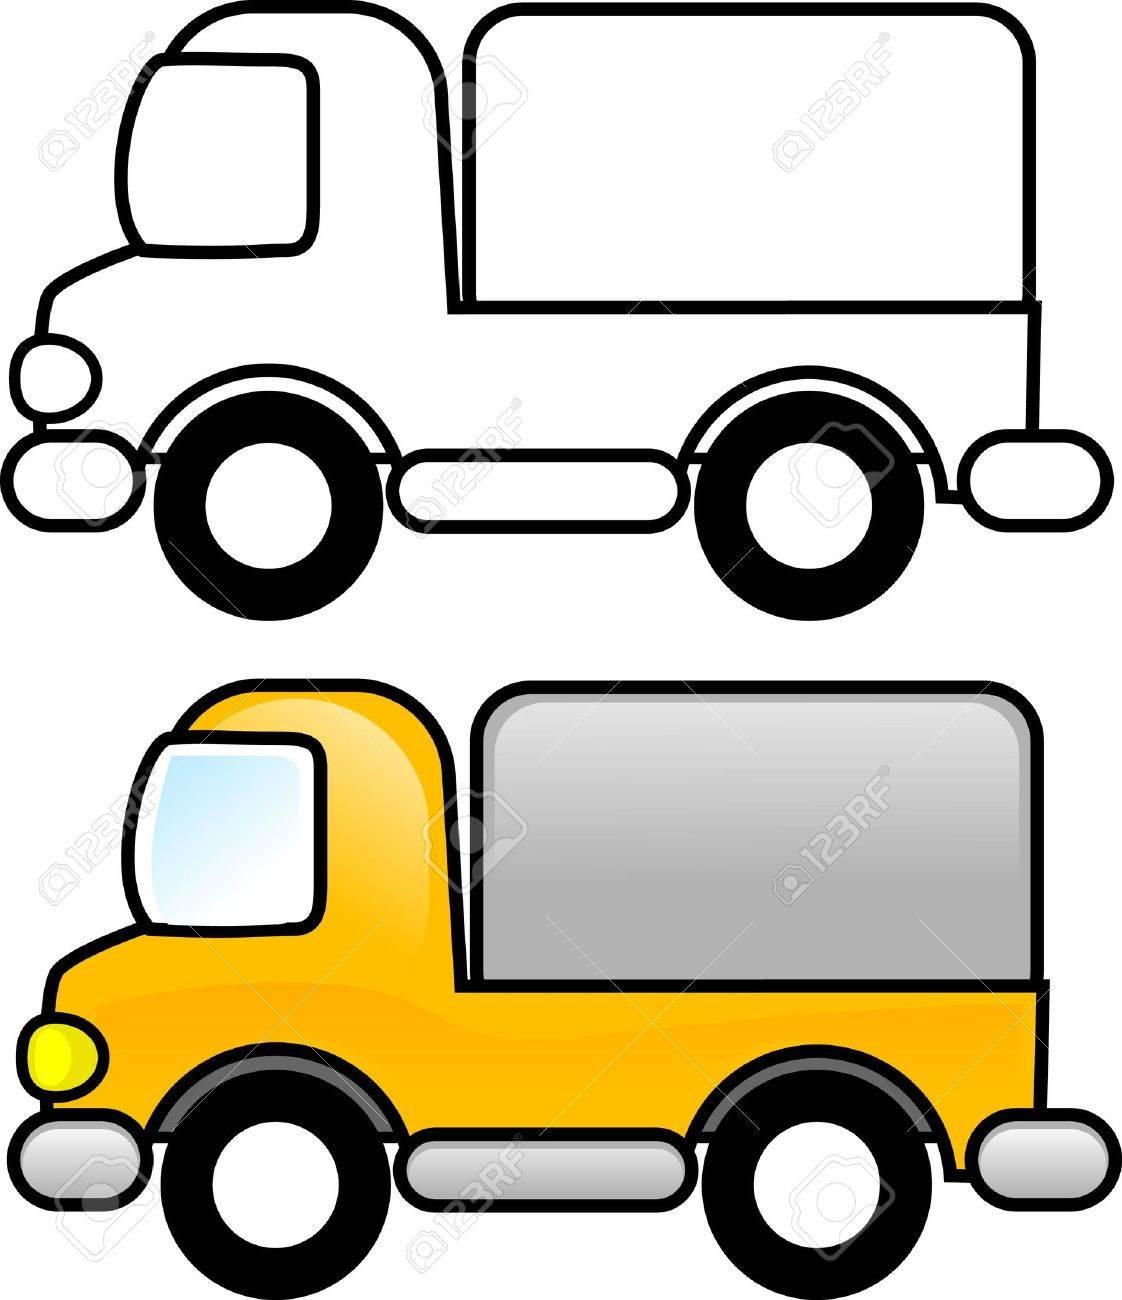 Único Camión Imprimible Para Colorear Modelo - Dibujos Para Colorear ...